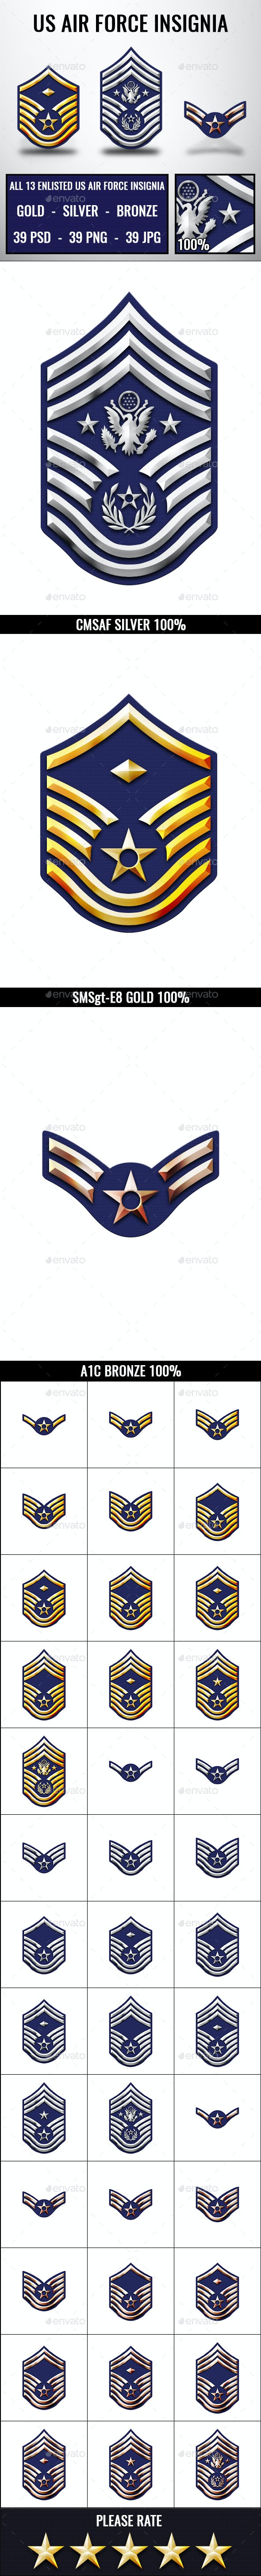 US Air Force Rank Insignia Badges